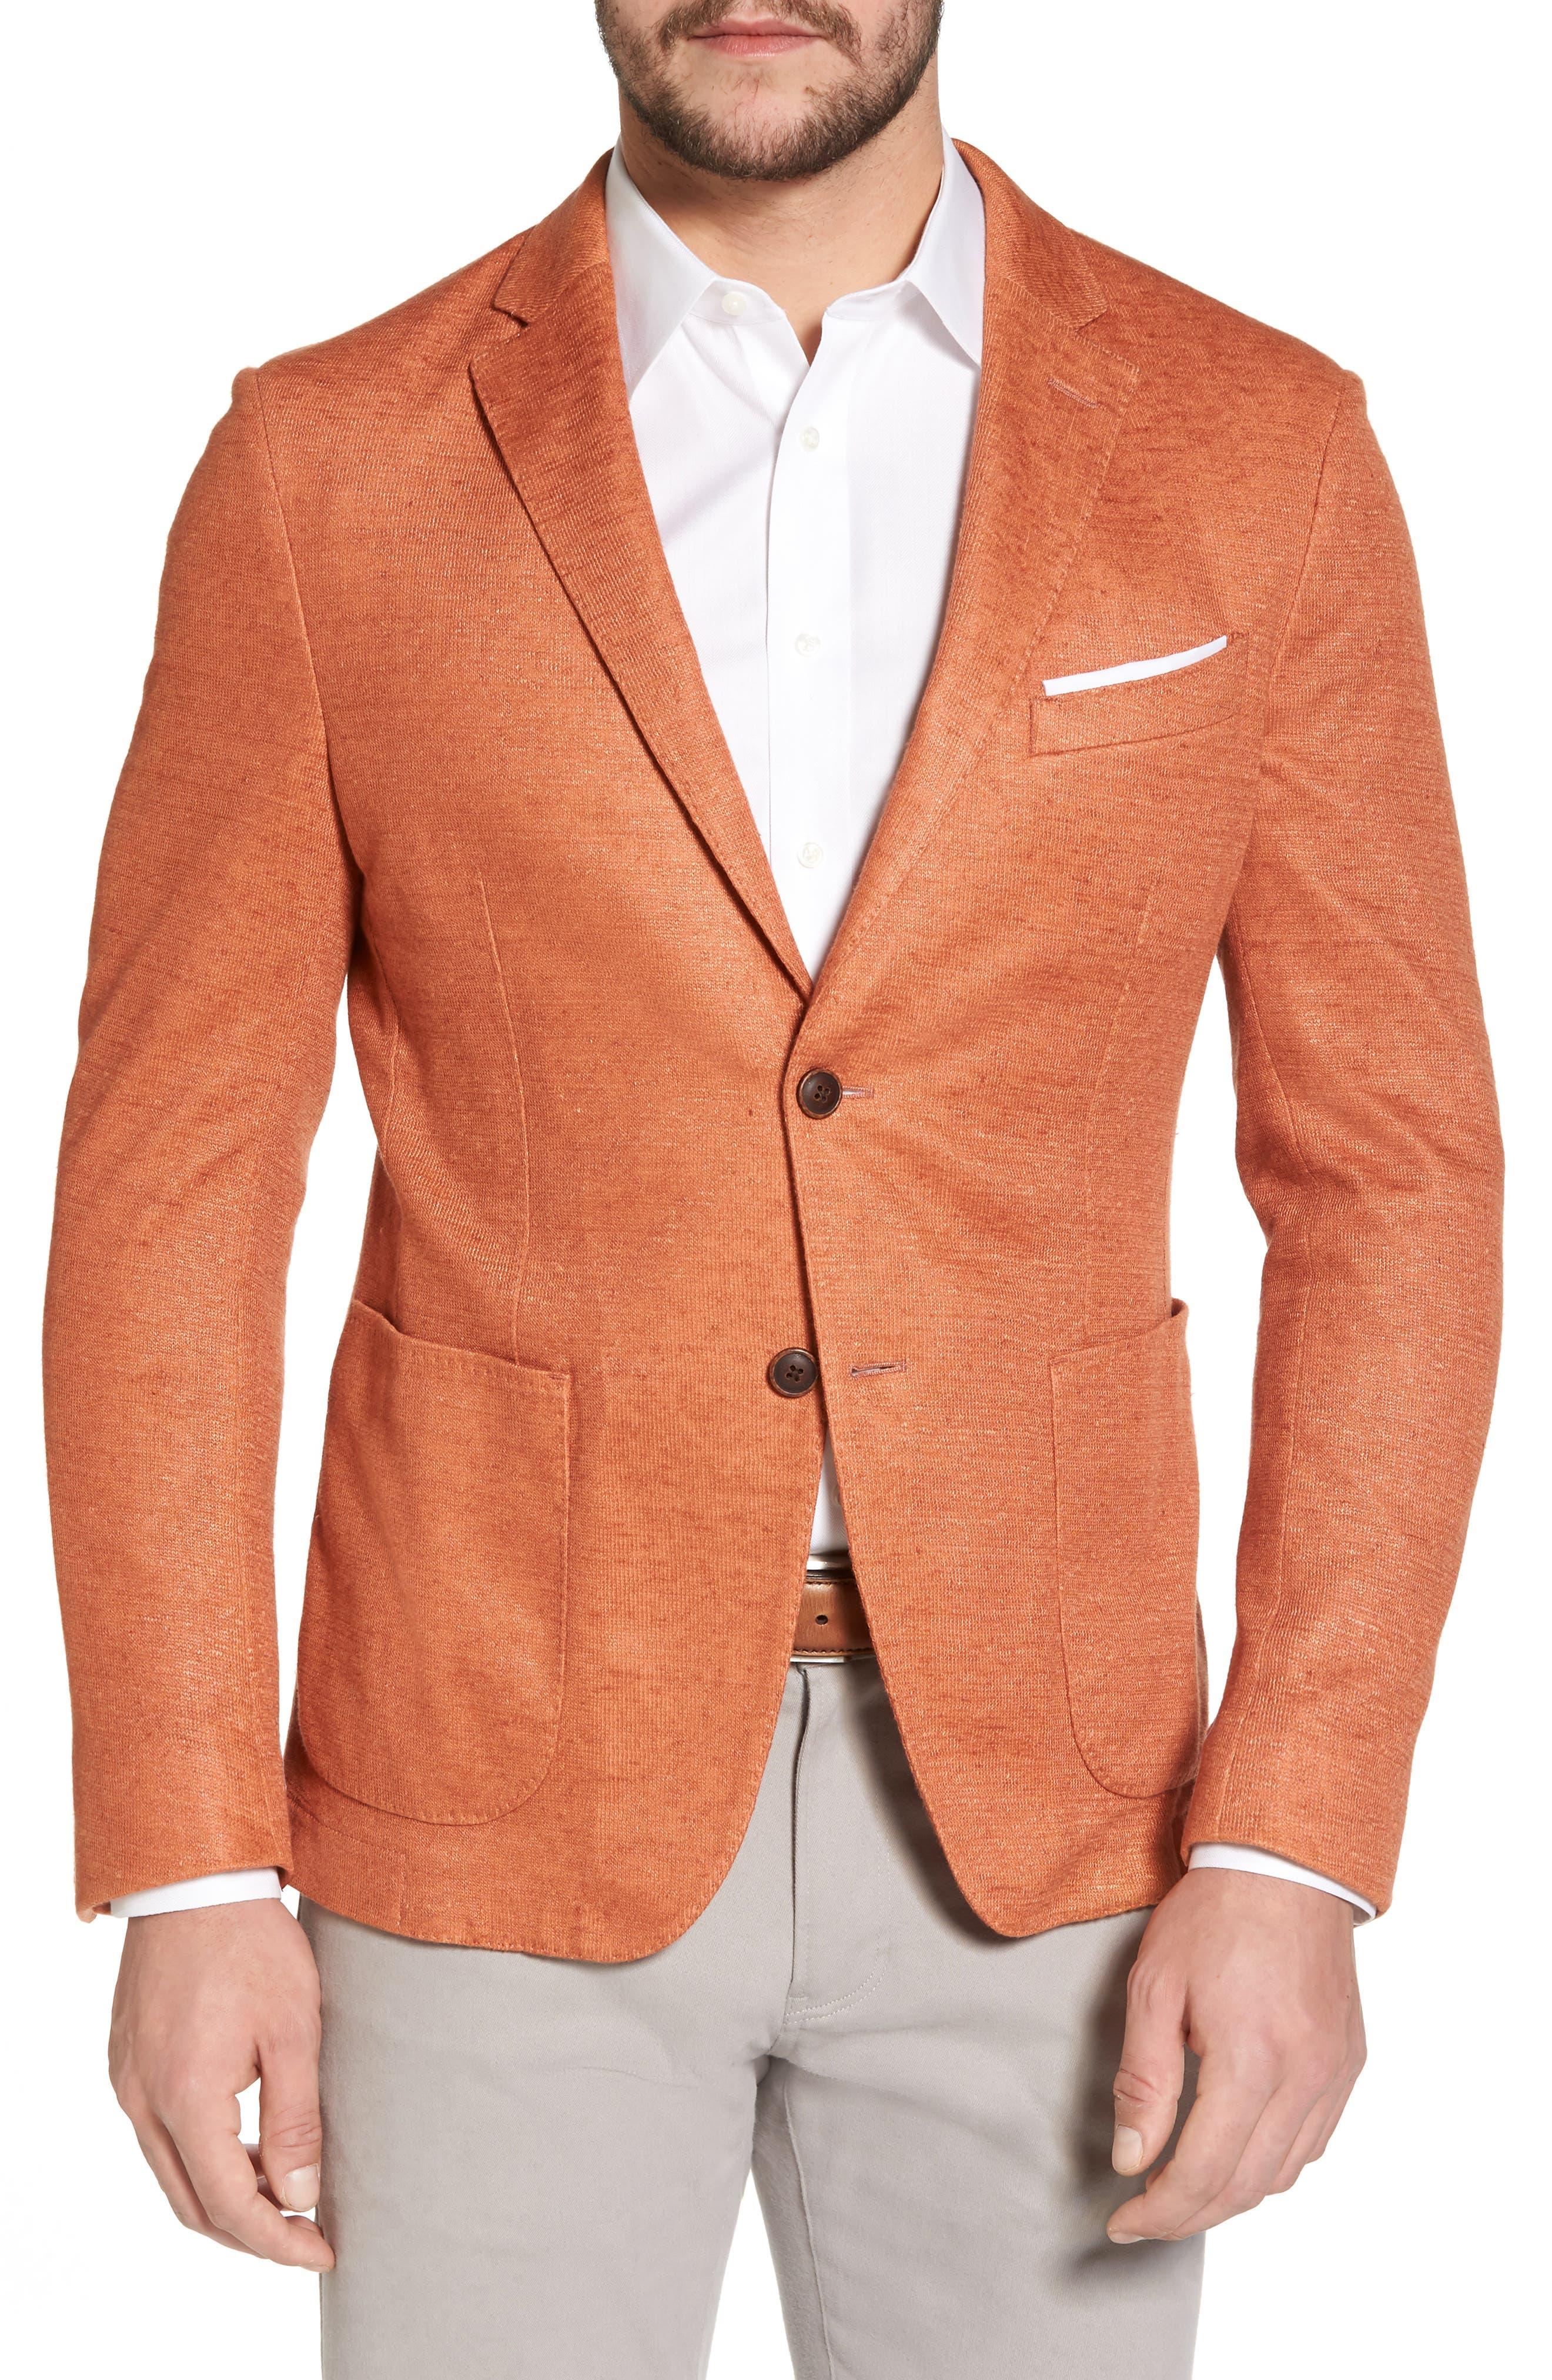 Trim Fit Heathered Jersey Blazer,                         Main,                         color, Orange